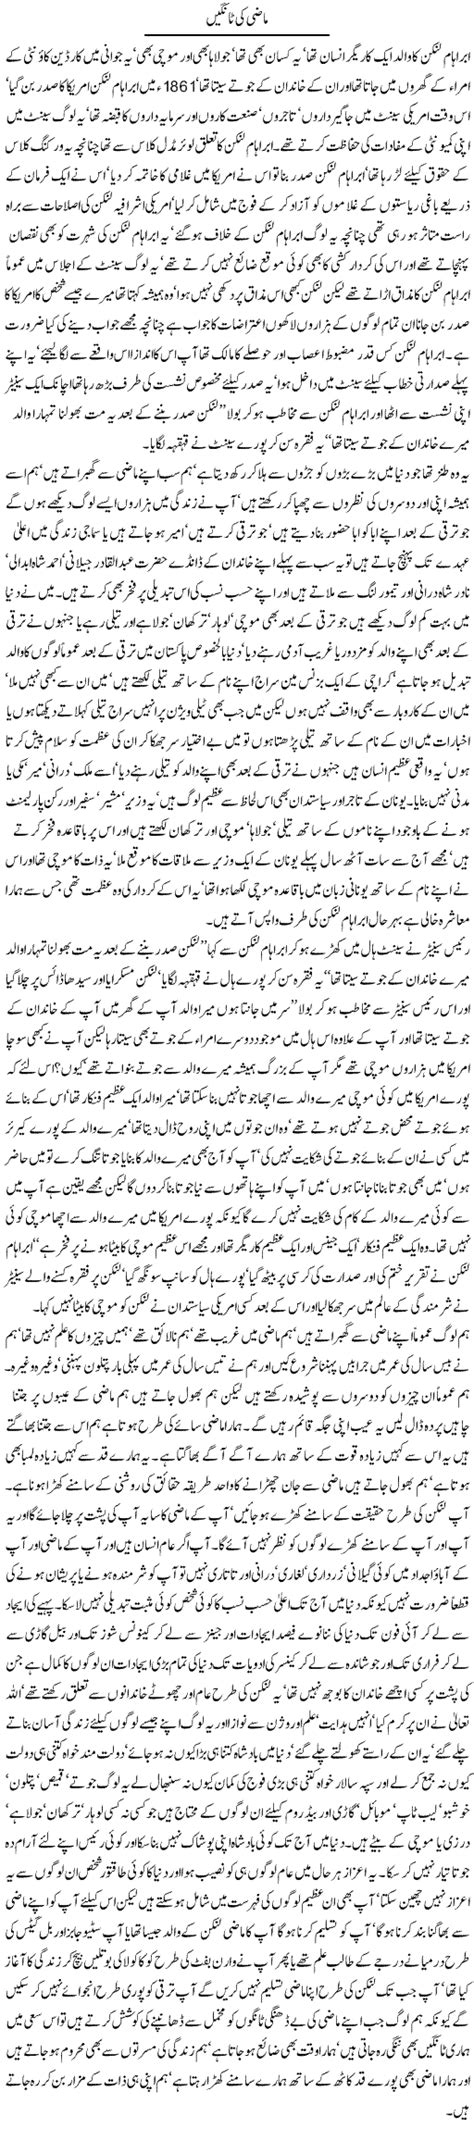 Top 10 golden rules to write an urdu column gif 512x2327